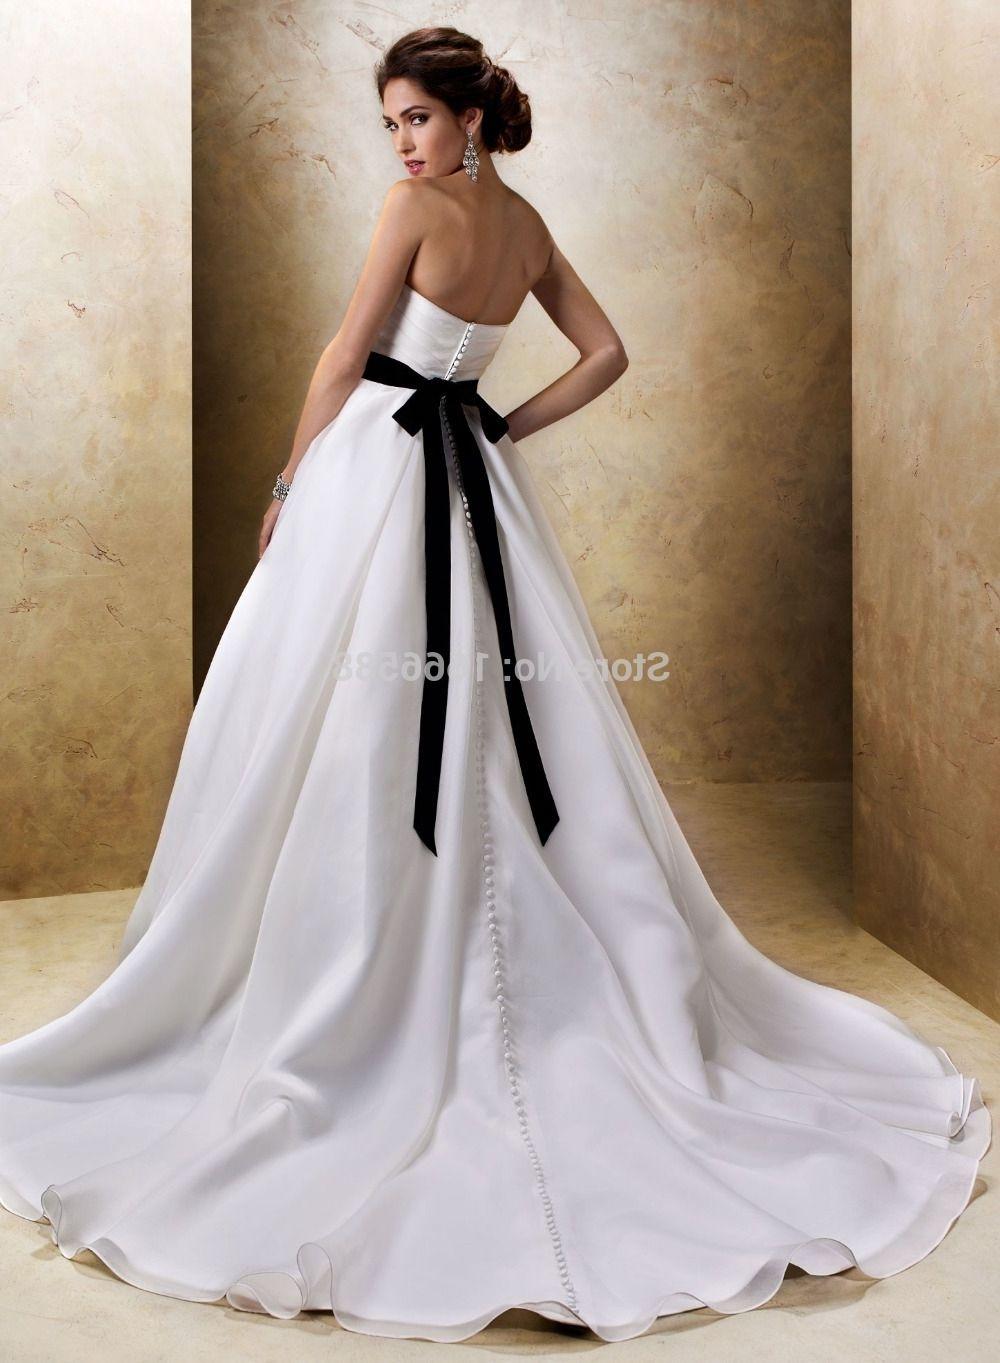 Black Sash On Wedding Dress Meaning Satin